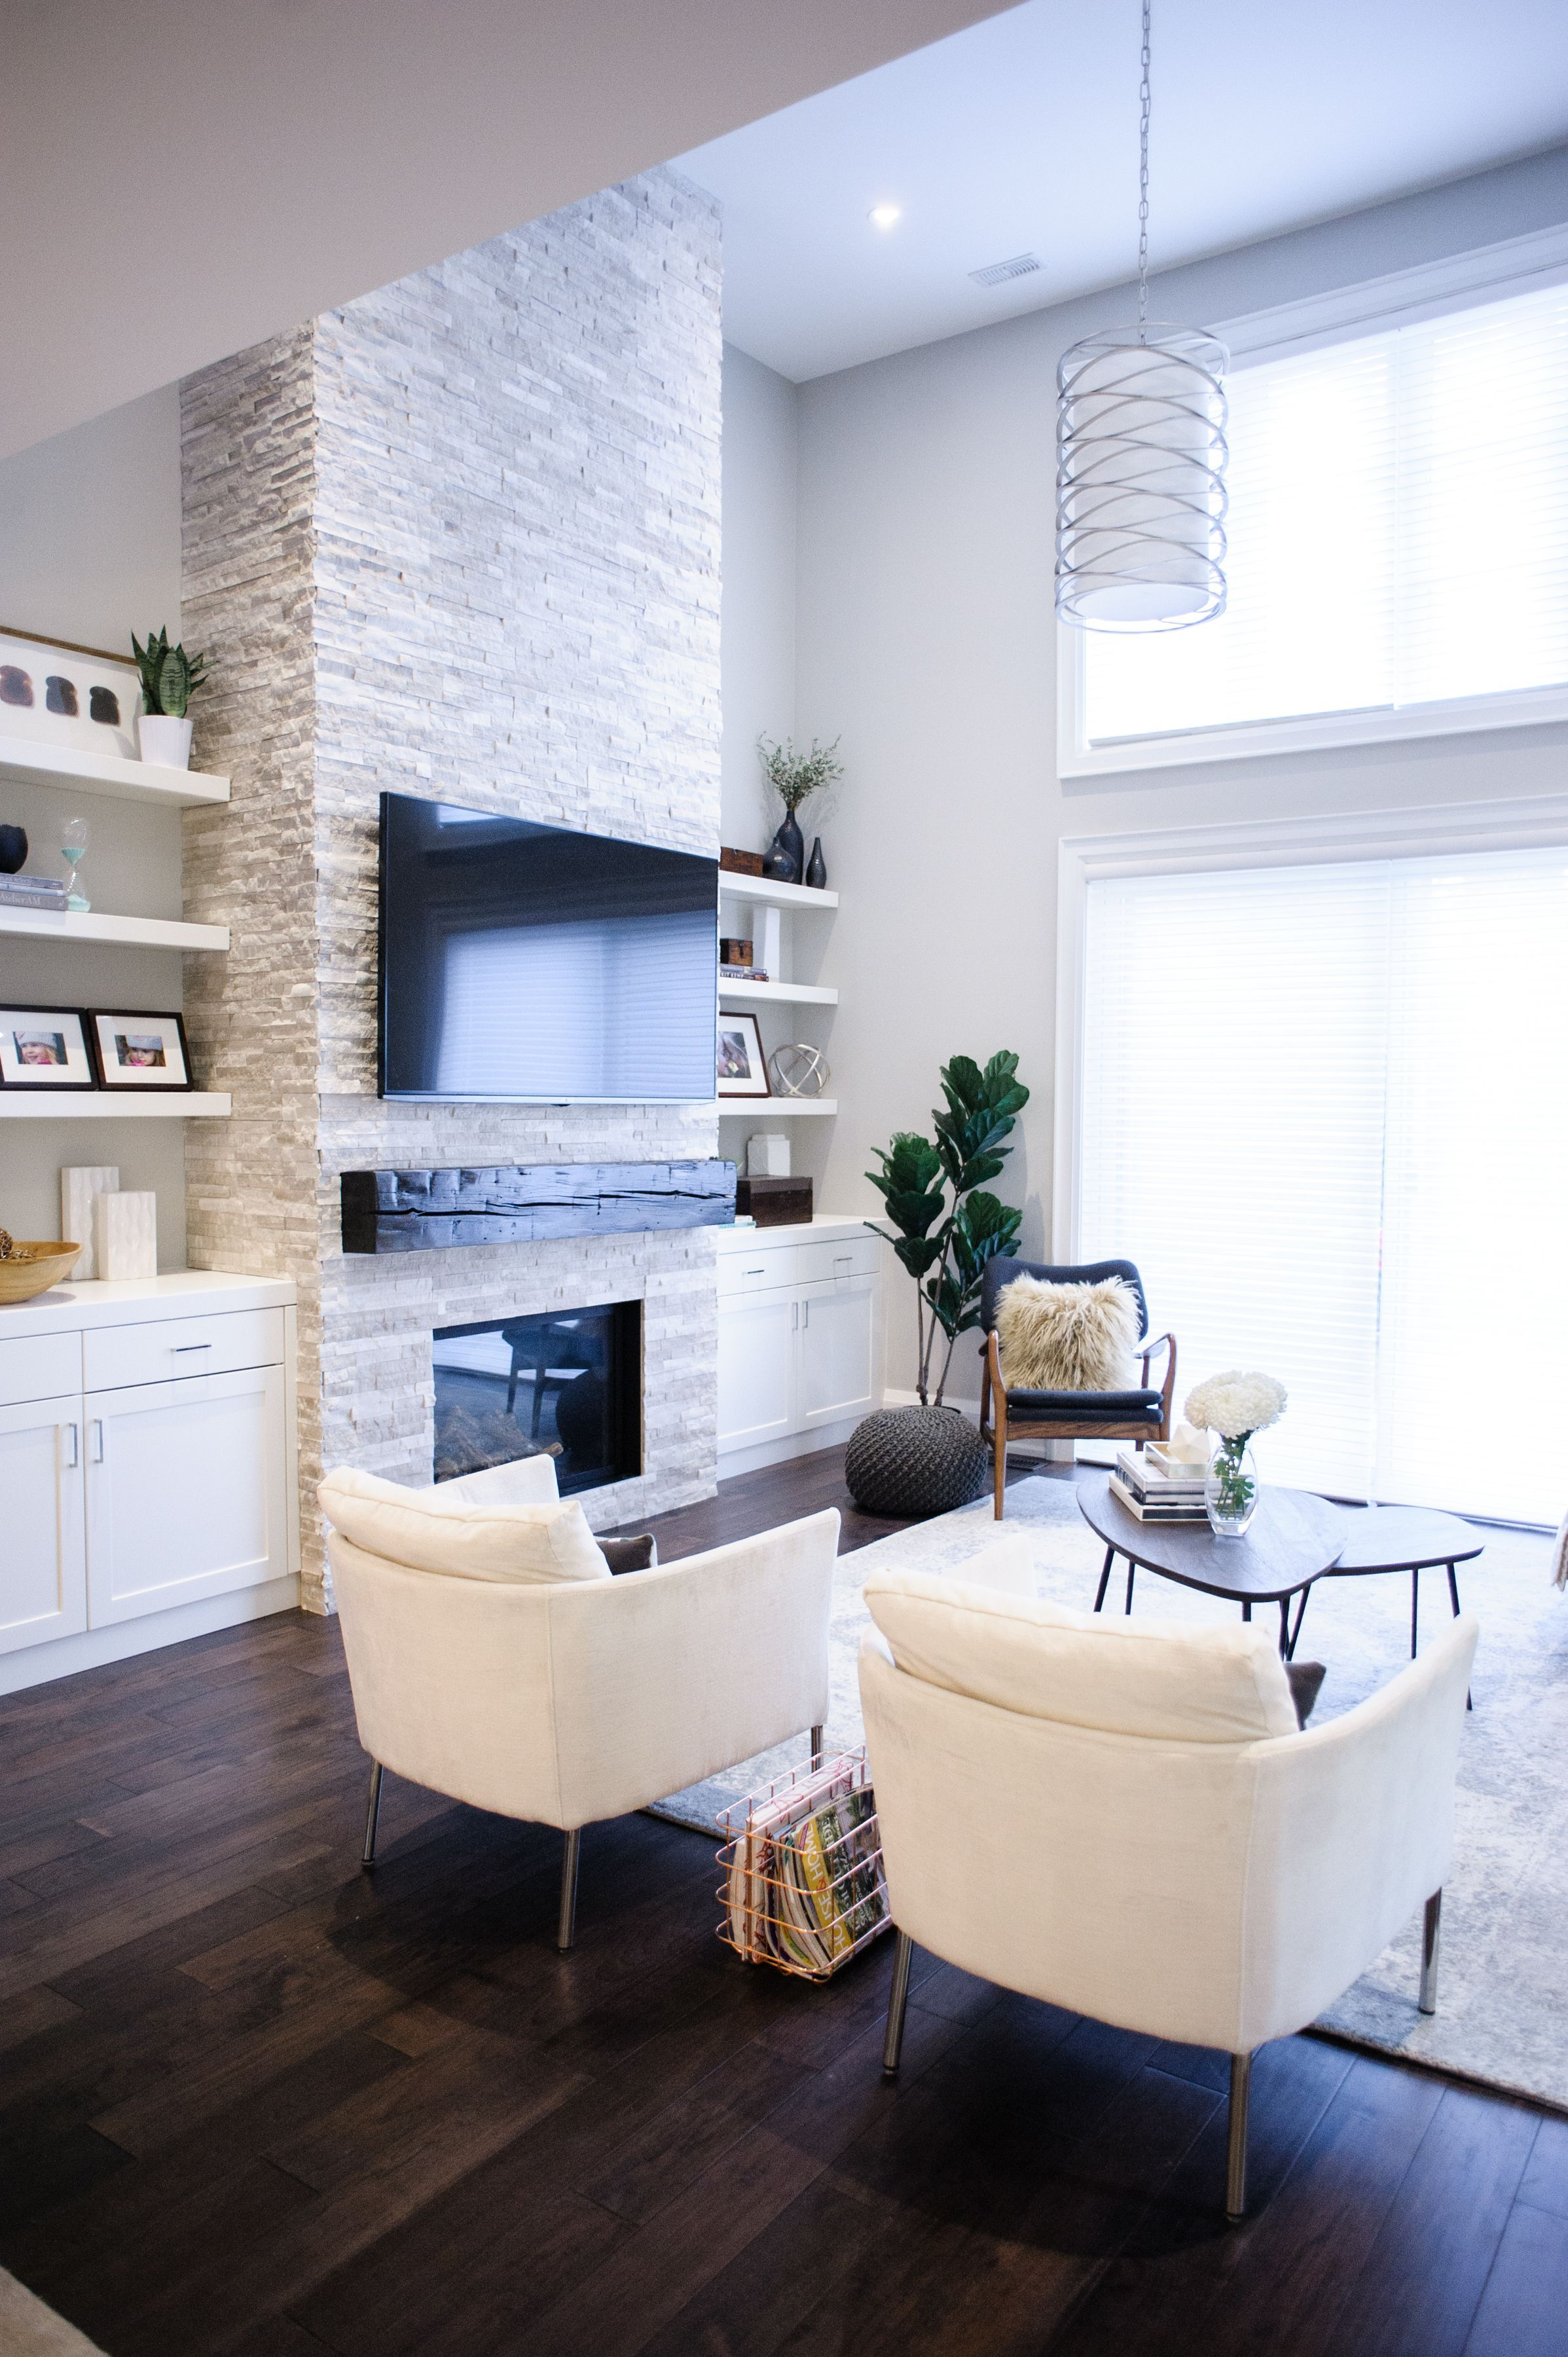 17 modern fireplace tile ideas for your best home design rh in pinterest com